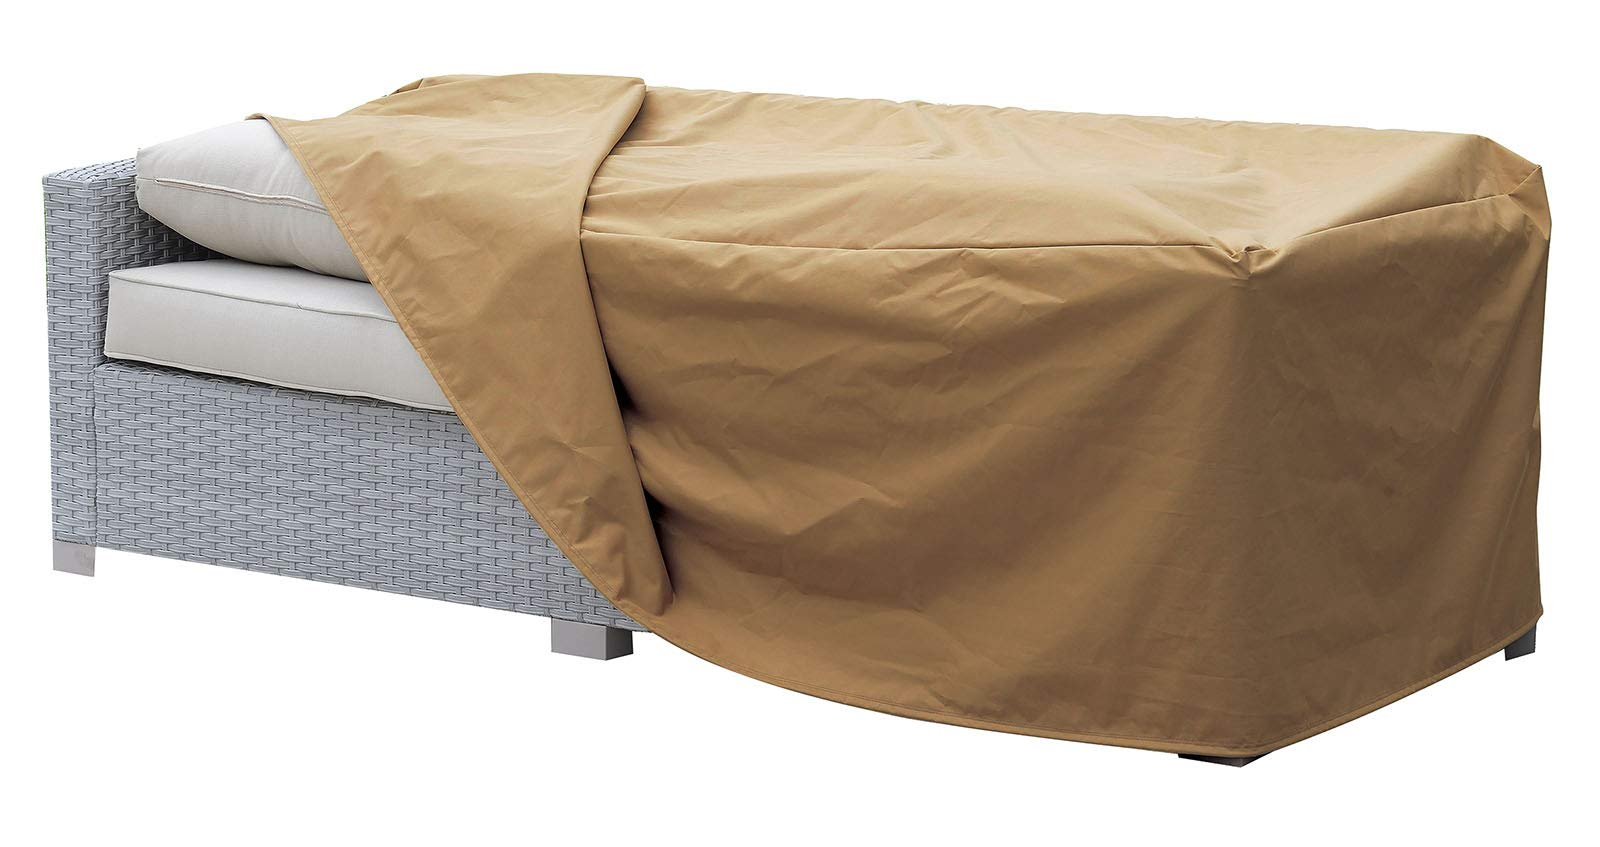 Benzara BM183735 Waterproof Fabric Dust Cover for Outdoor Sofa, Brown